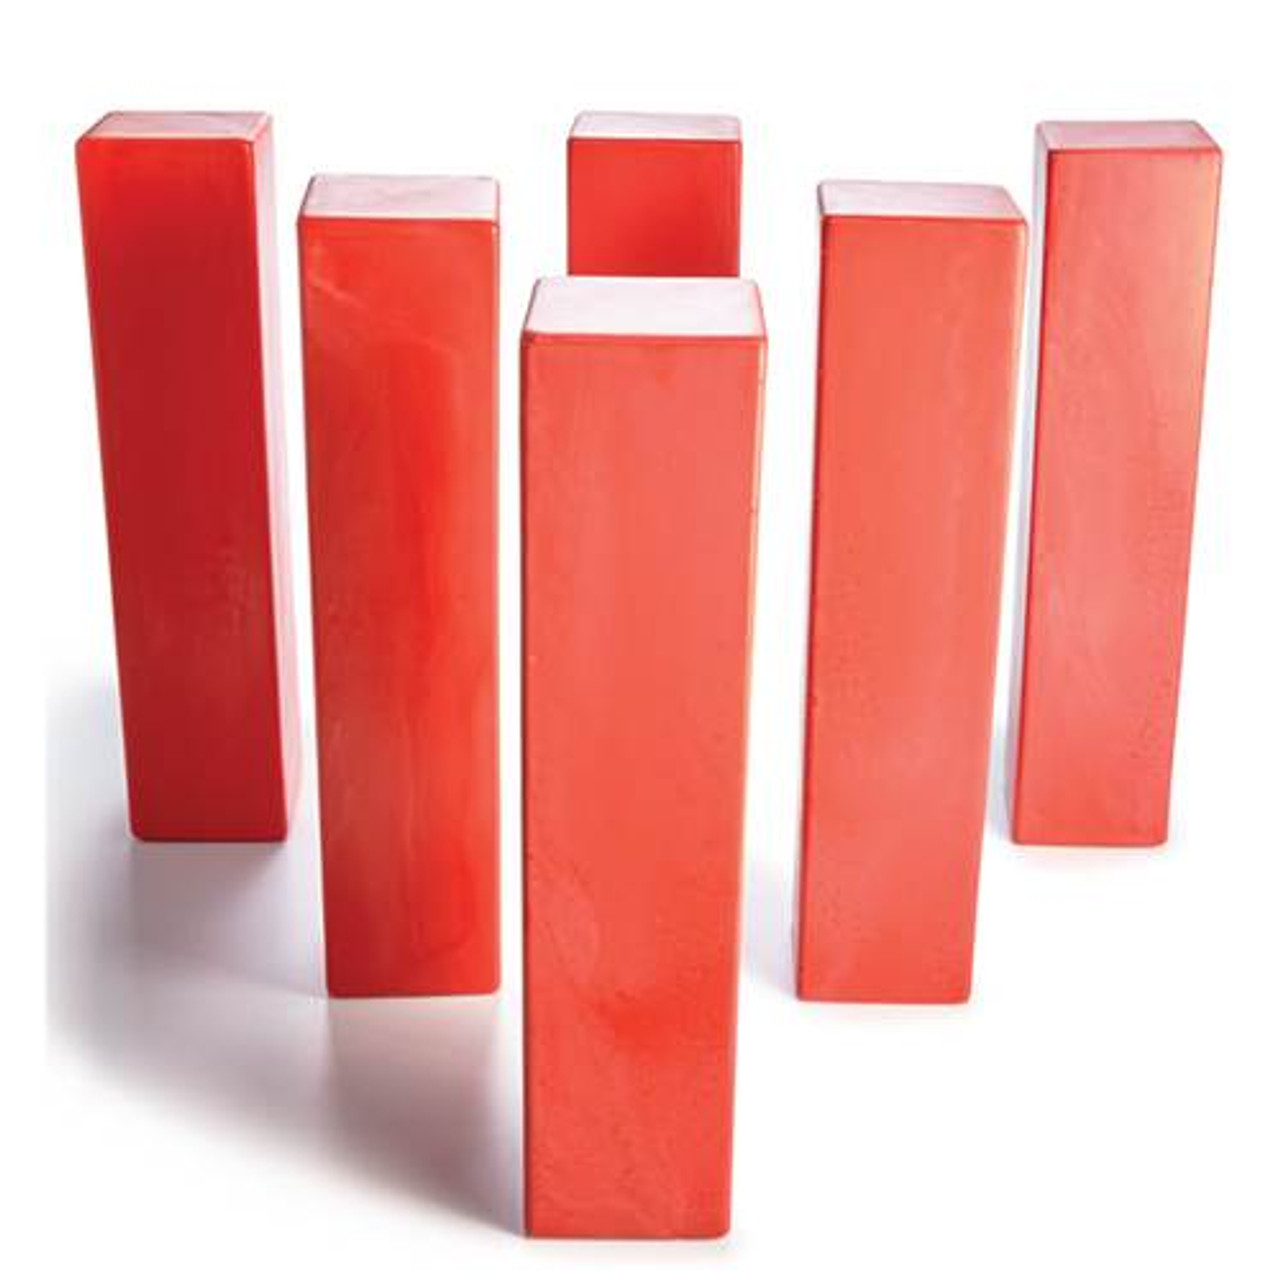 BSN Molded Football Foam Pylons - Set of 6